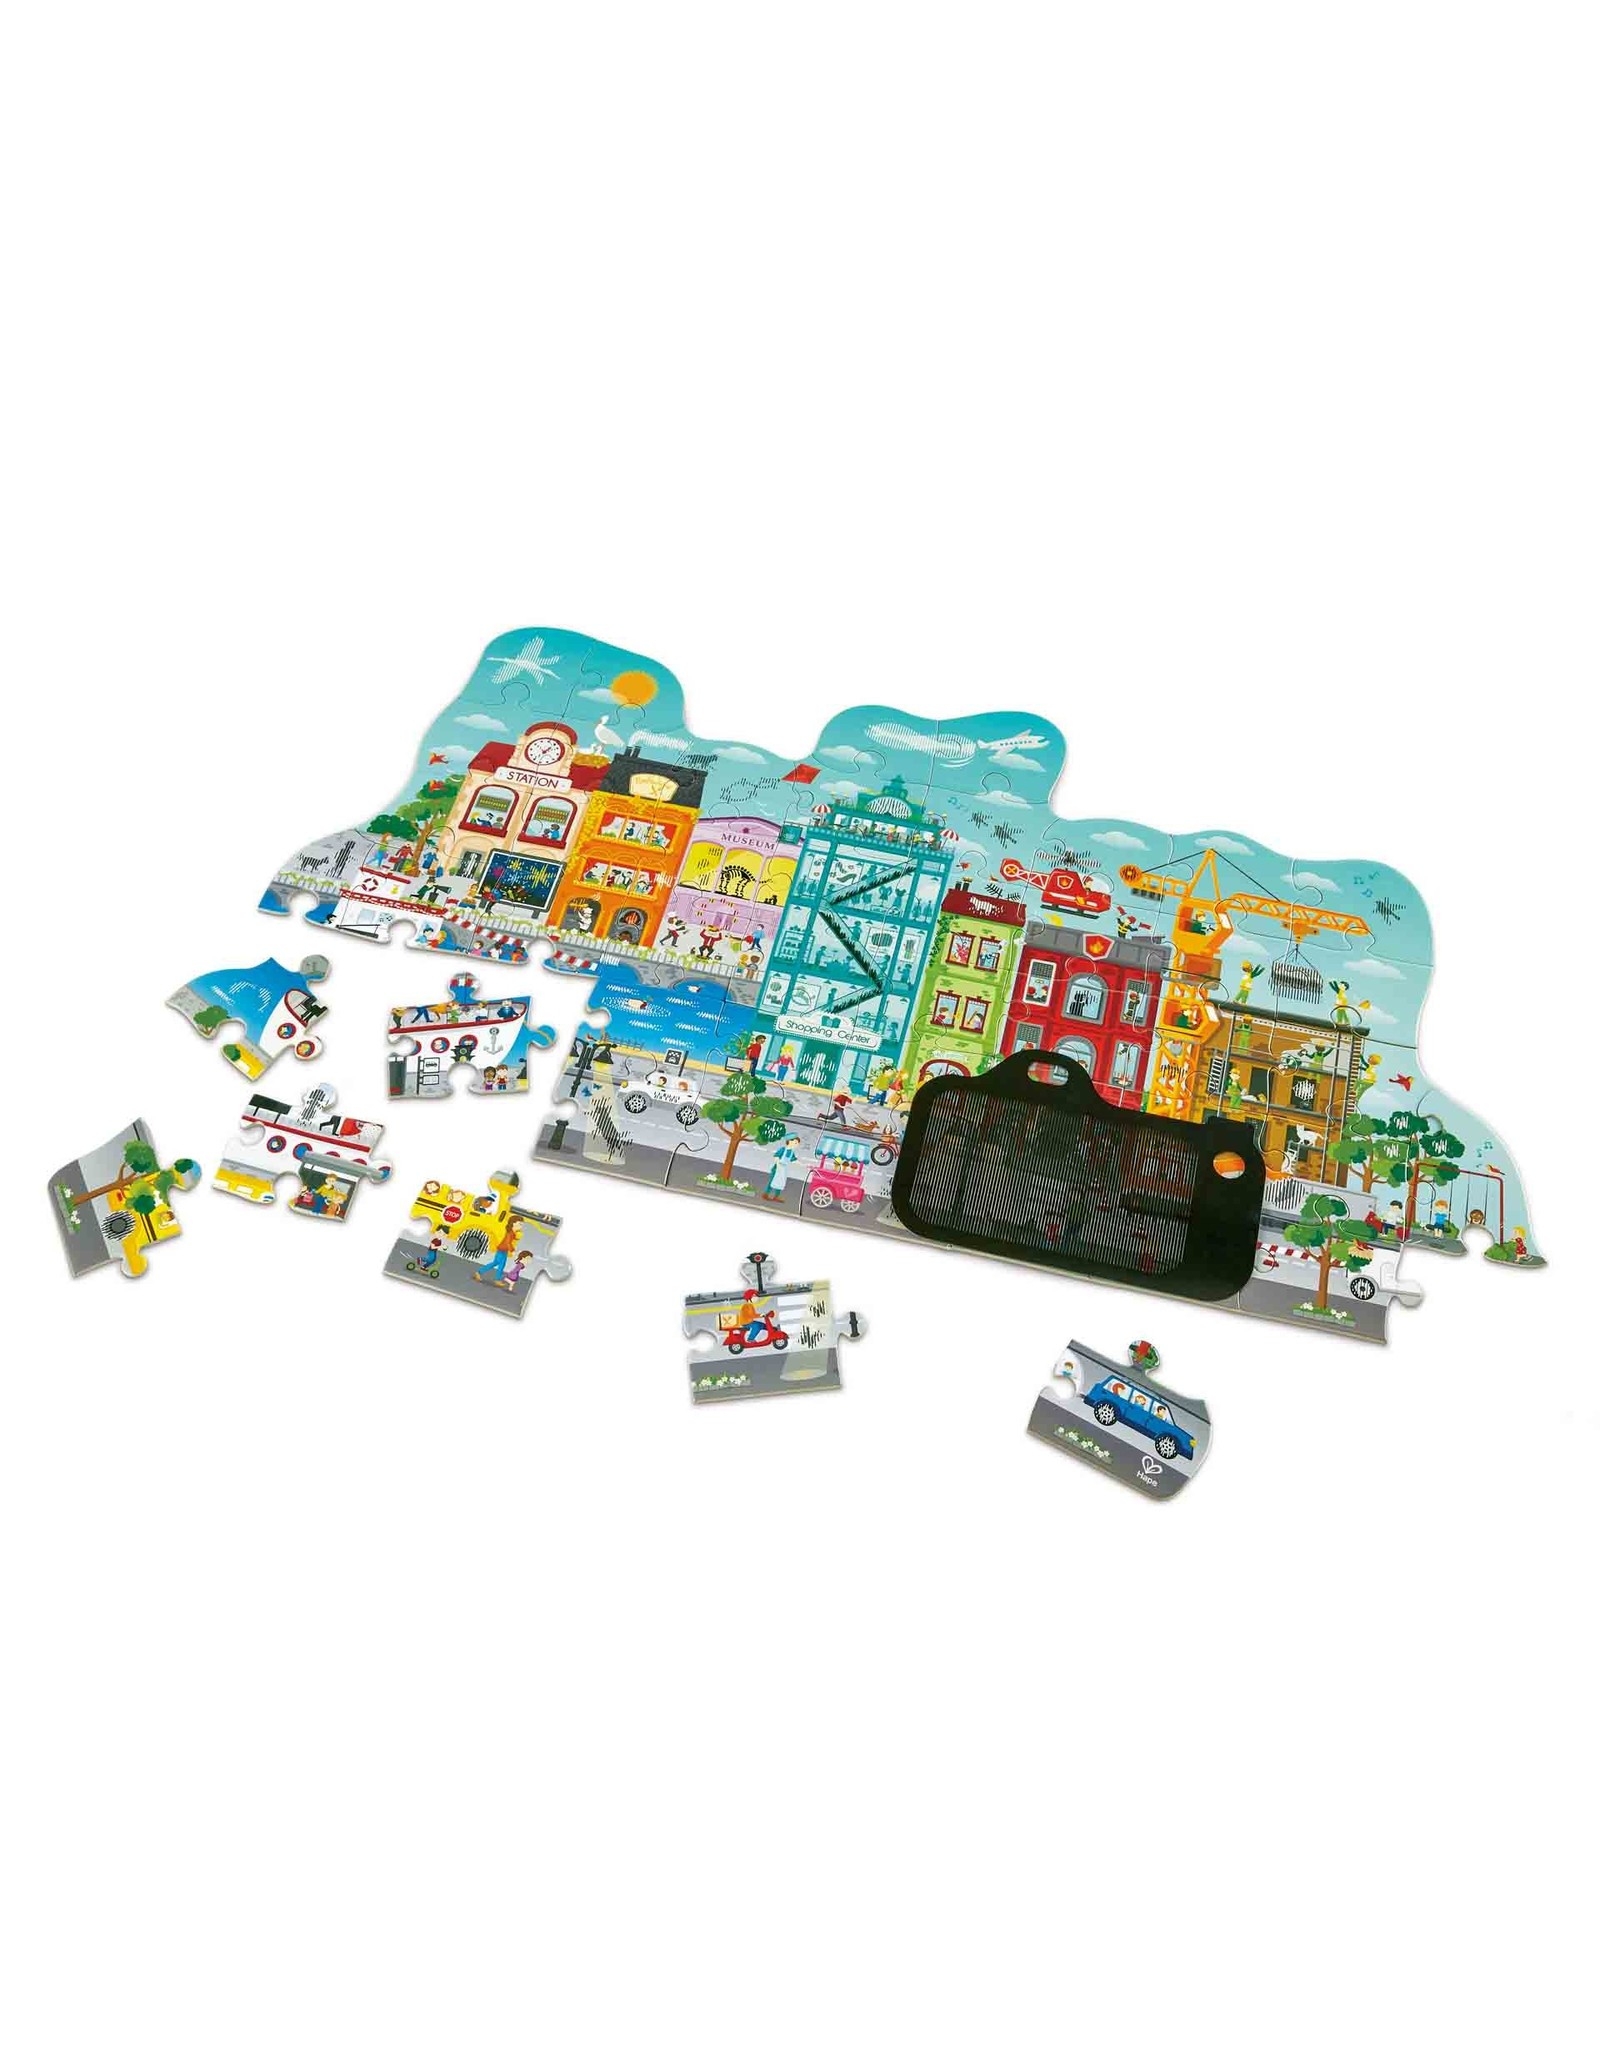 Hape 50 Pcs. Animated City Puzzle